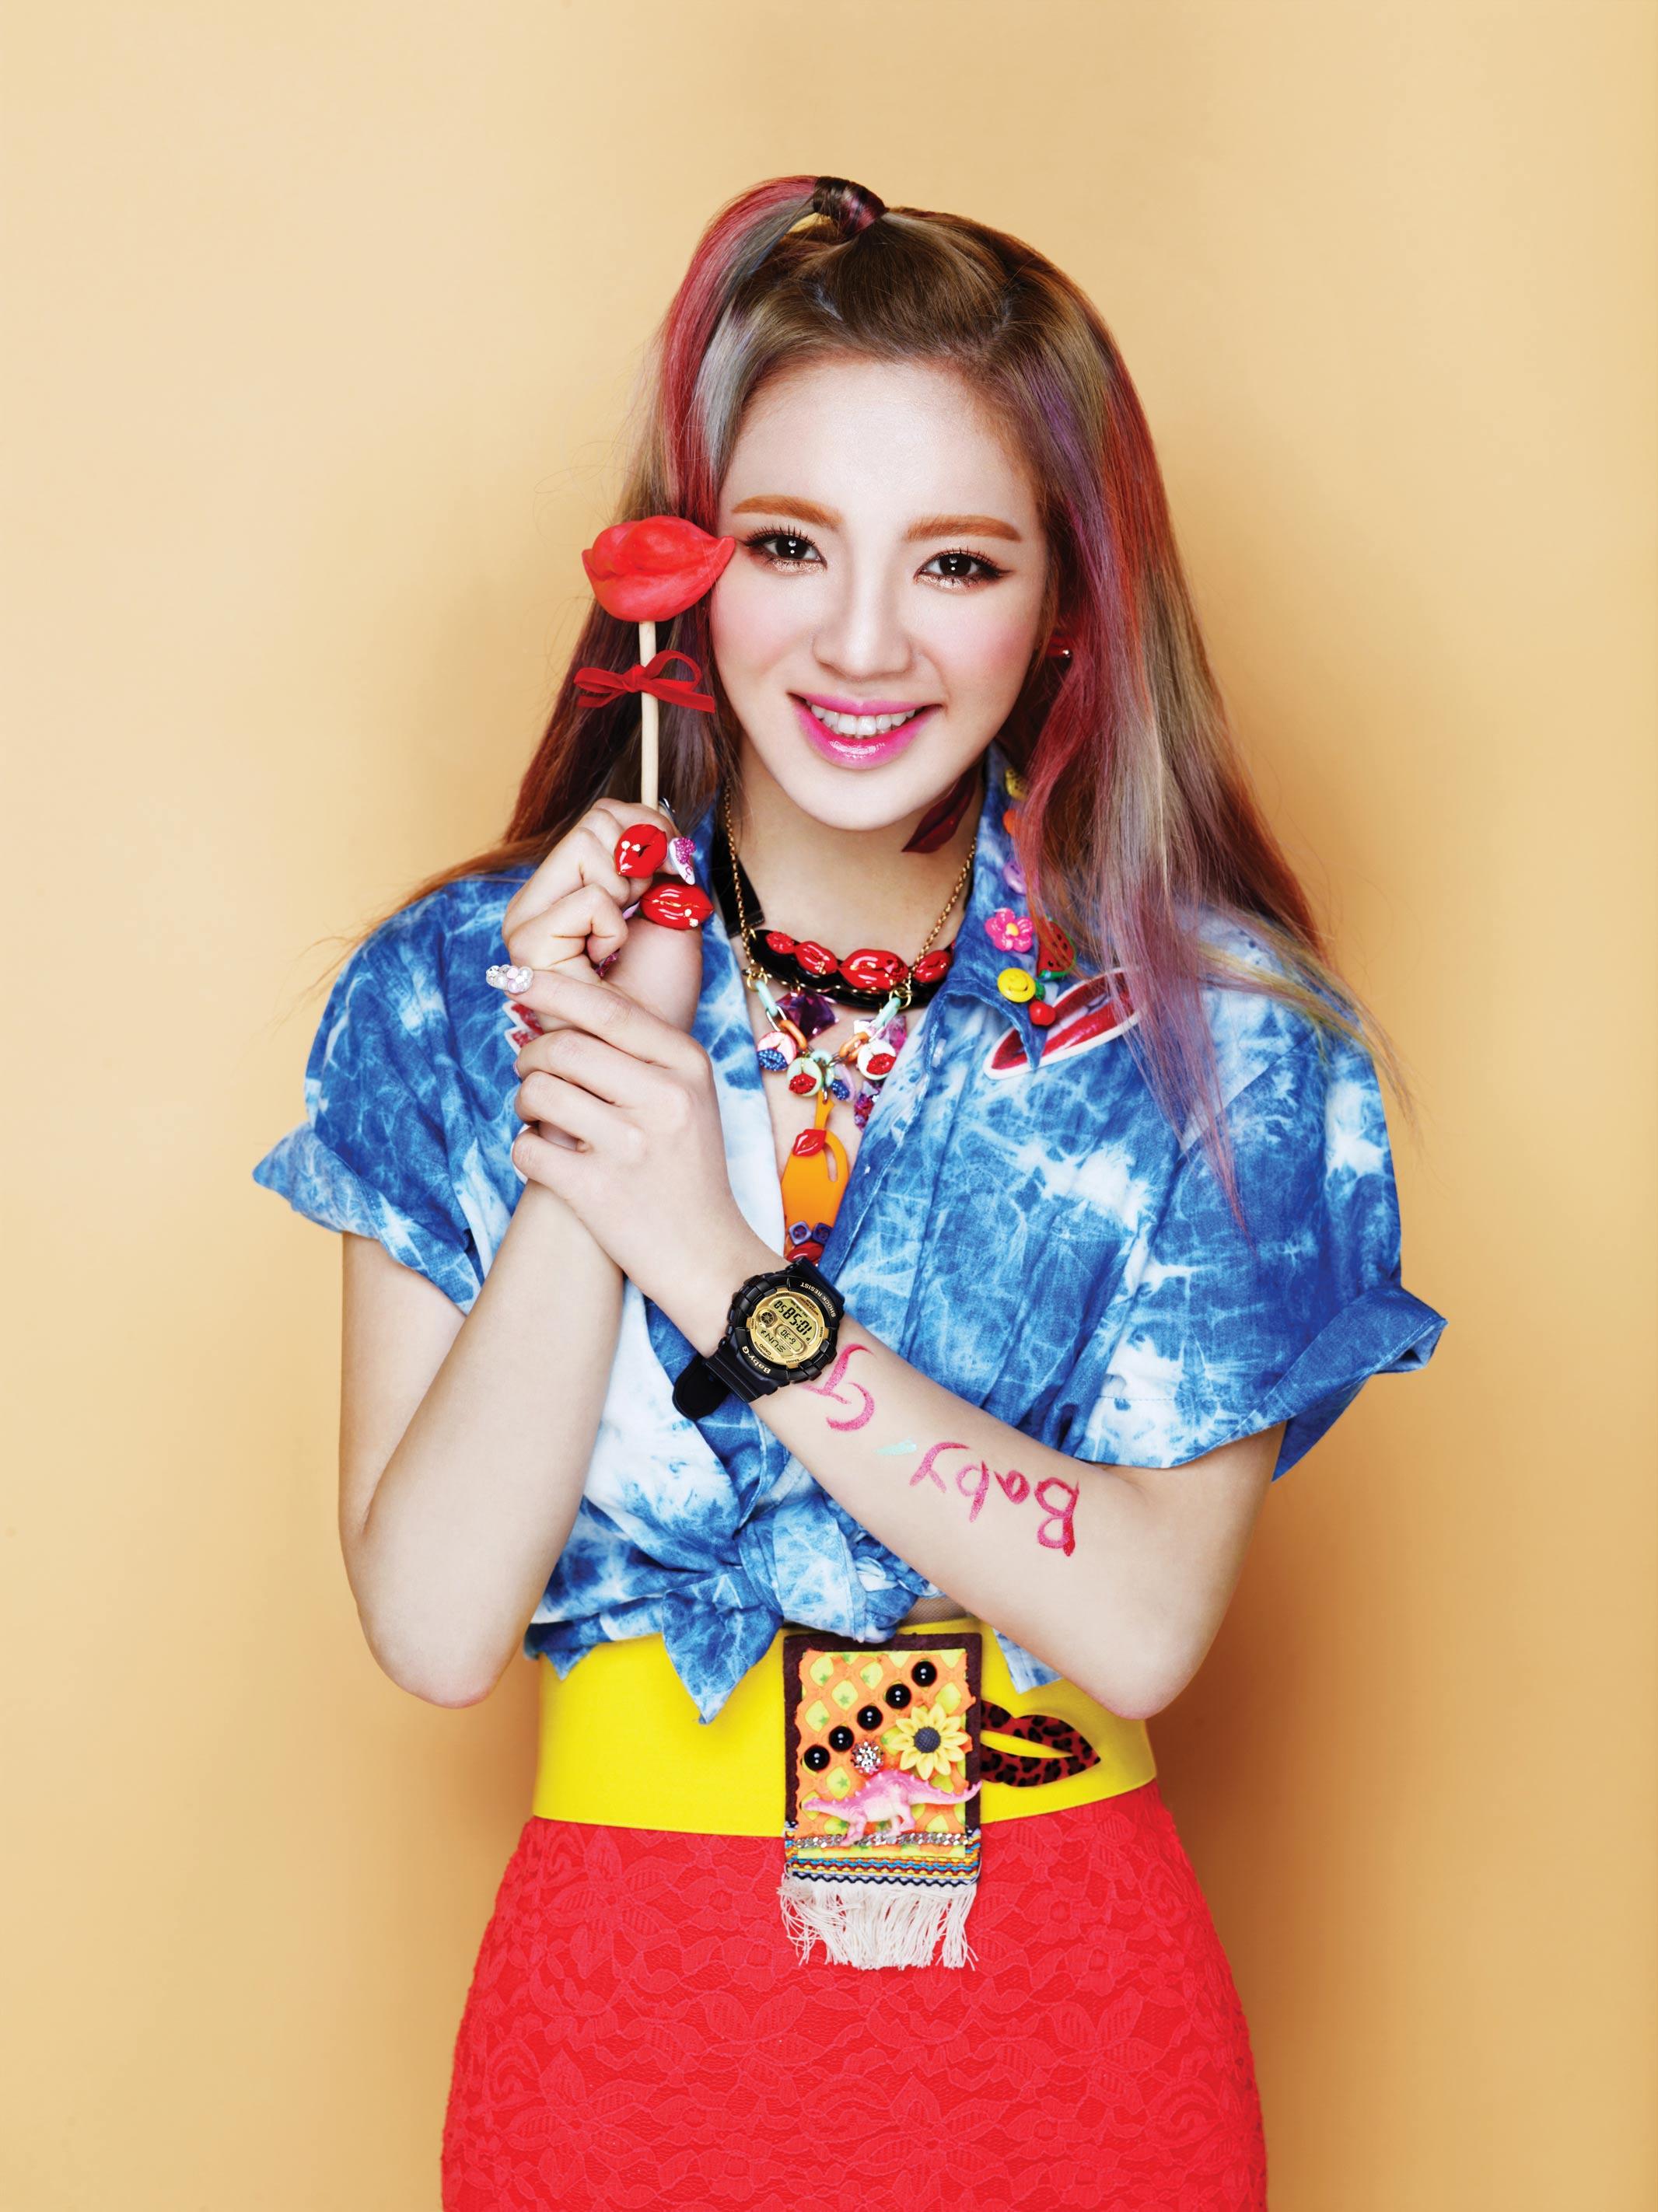 Girl generation hyoyeon dating service